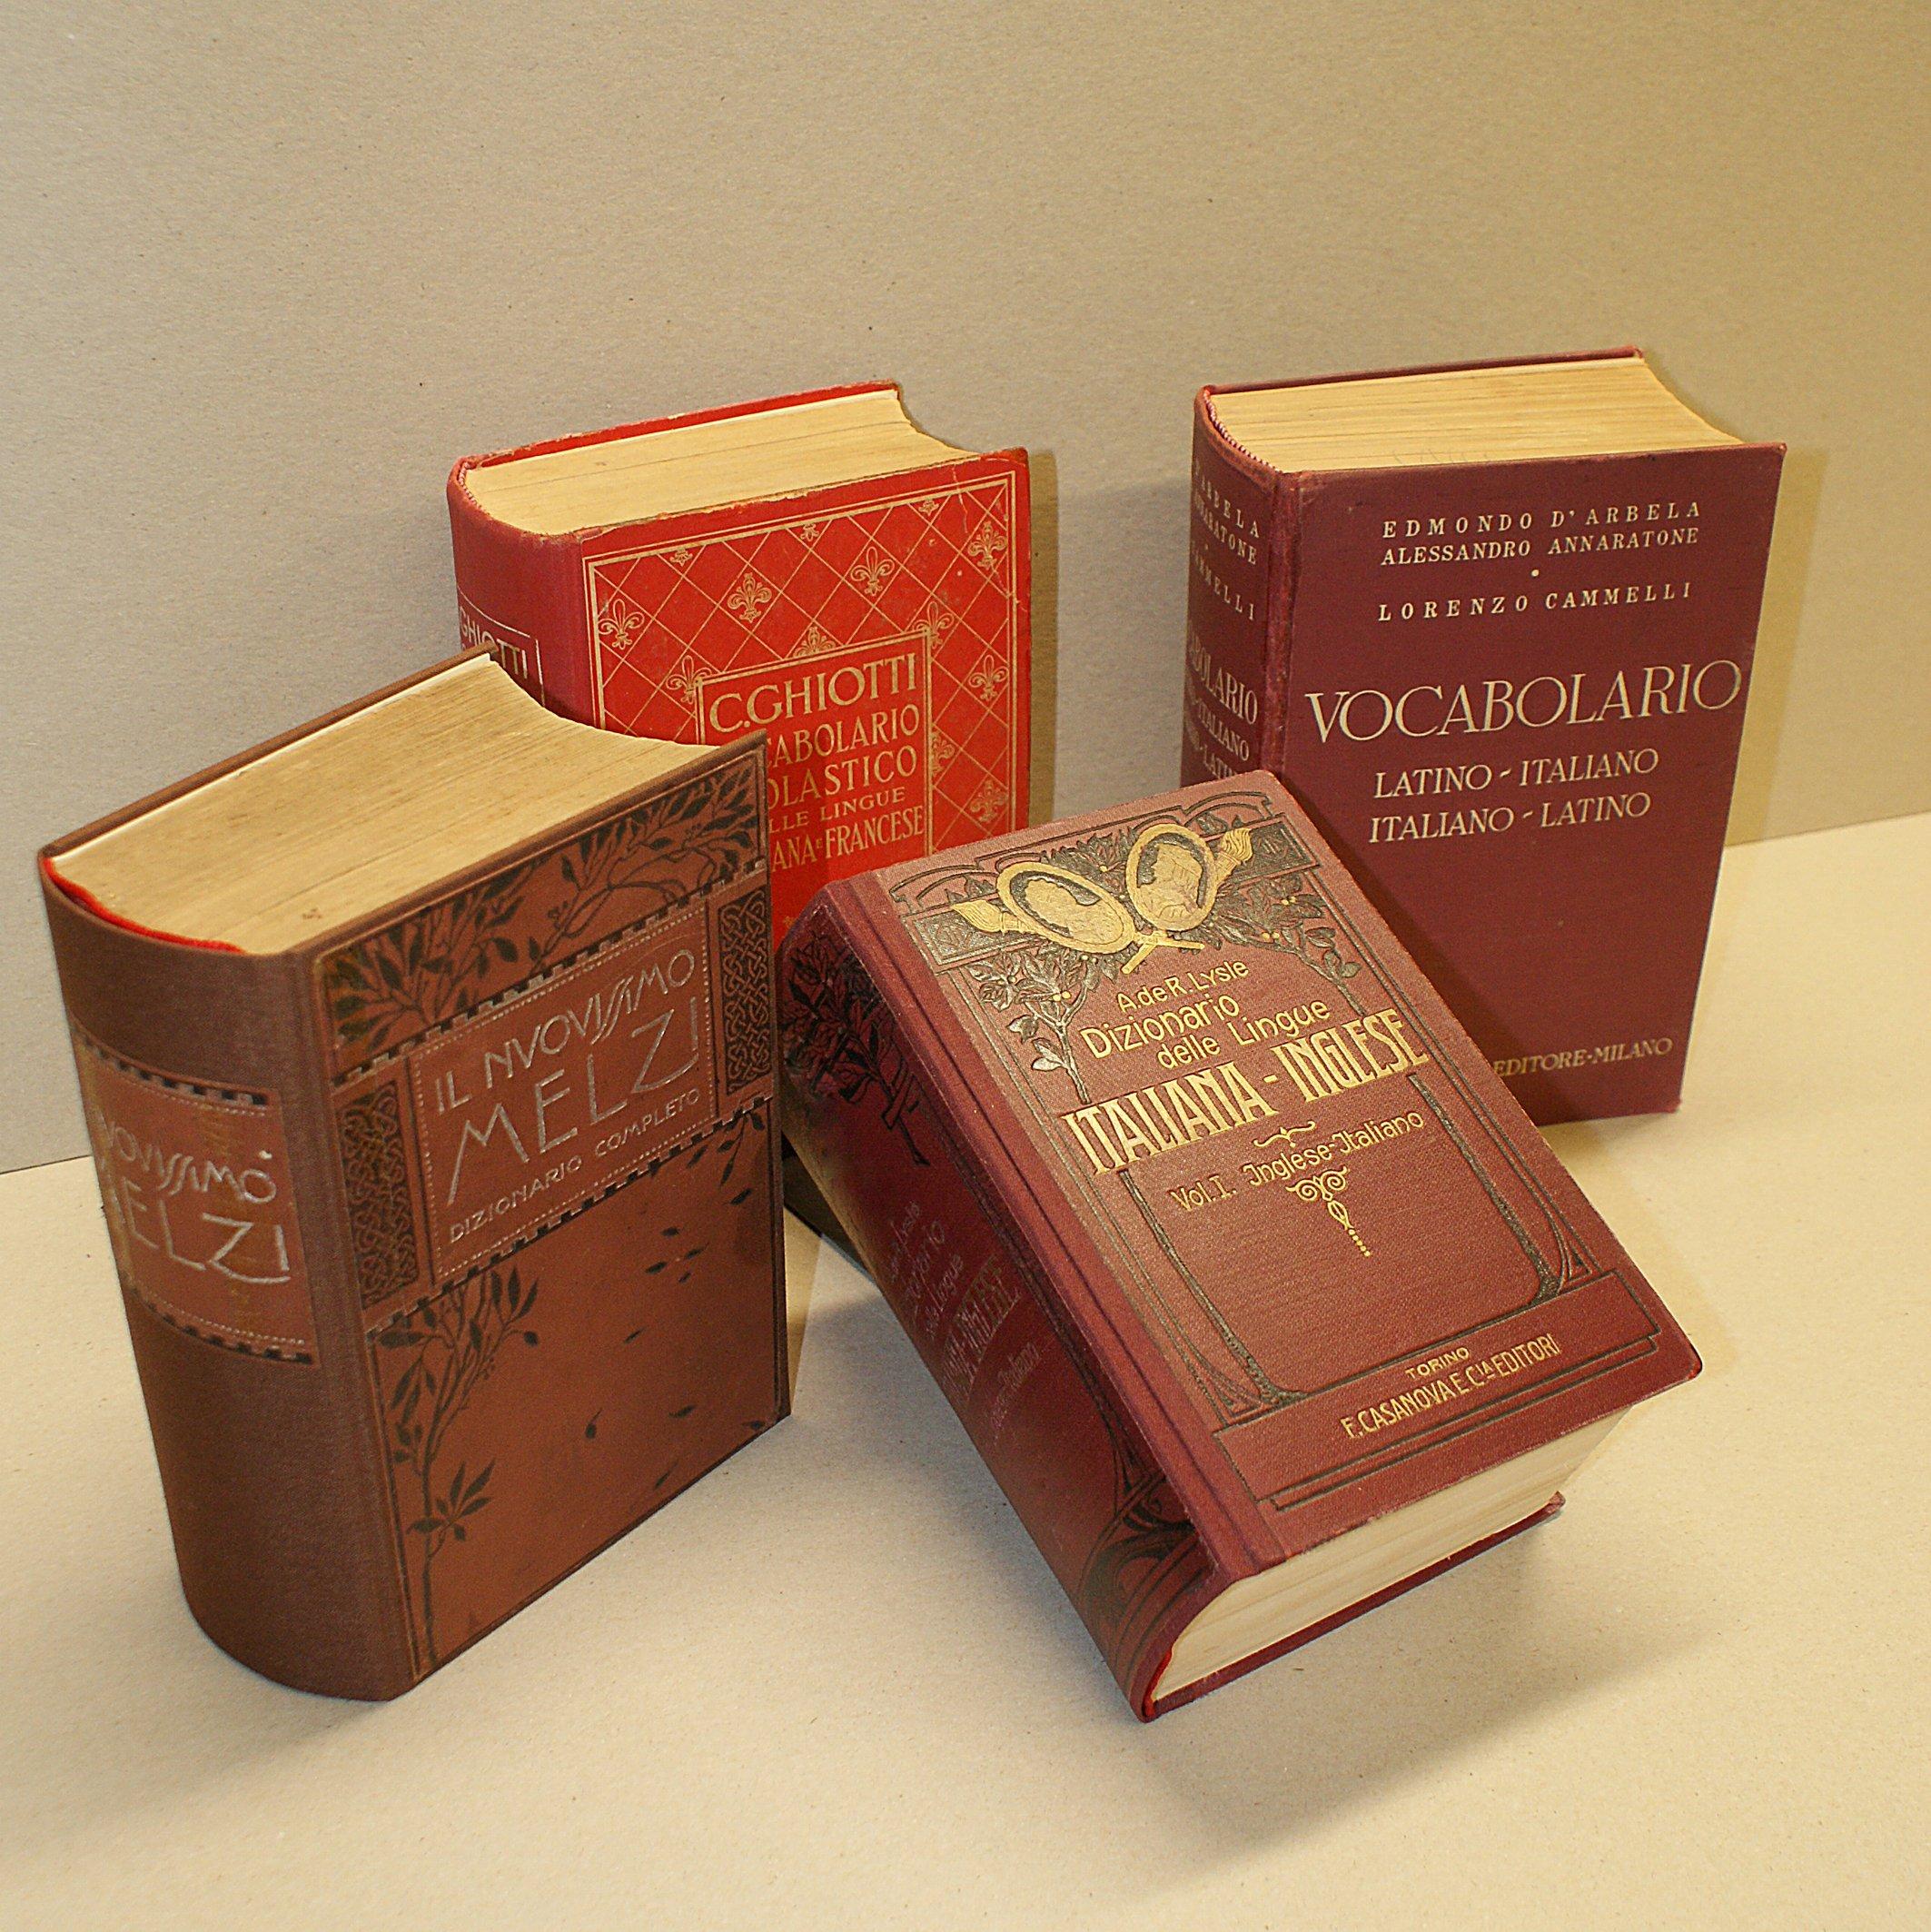 libri antichi dalla copertina rossa e scritte dorate restaurati